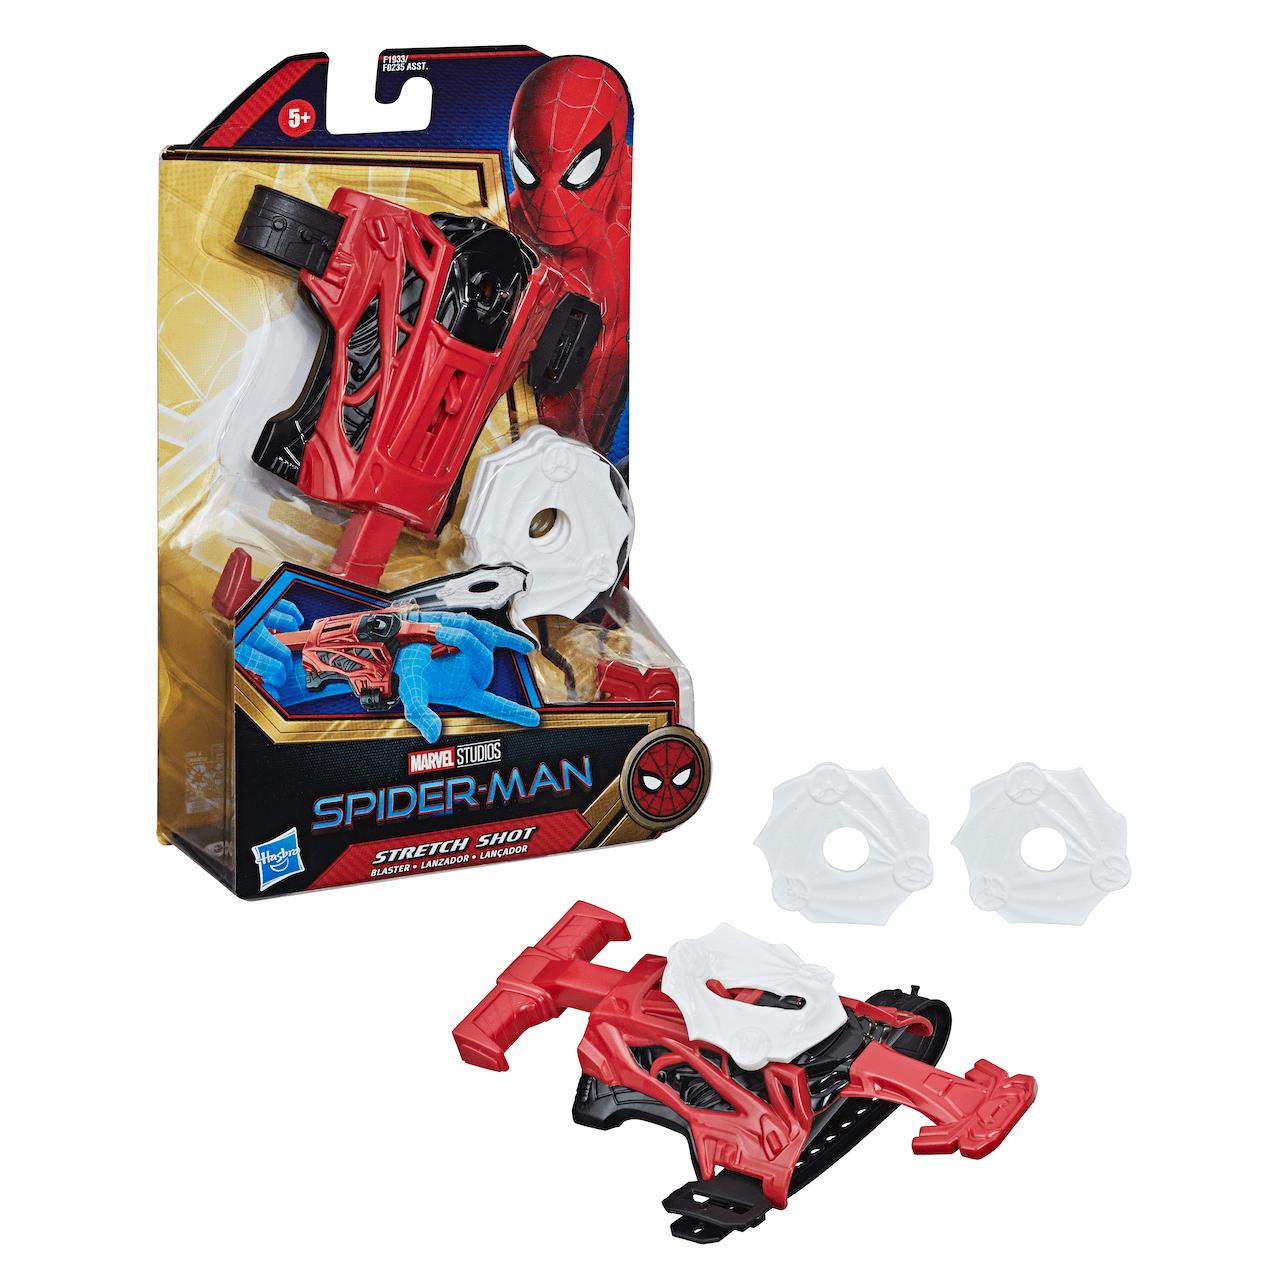 Spider-Man Hero Blaster Red and Black